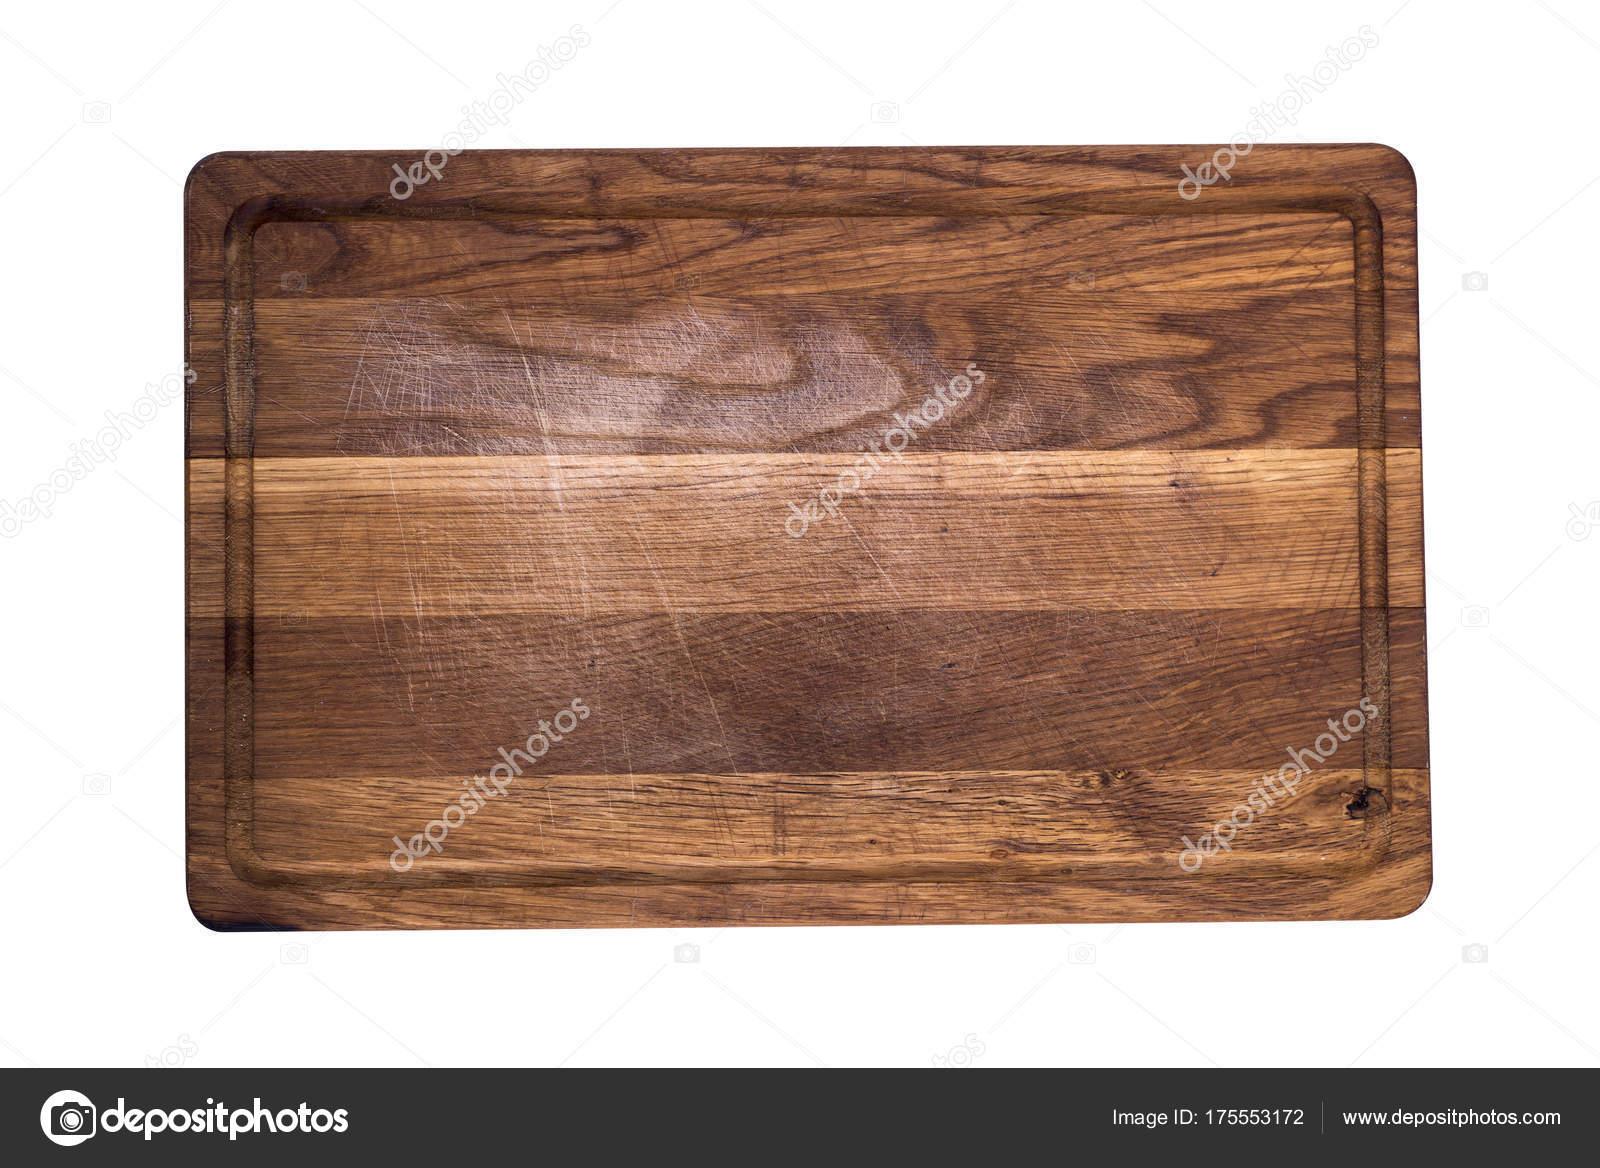 Oude houten plank van de lege keuken u2014 stockfoto © nndanko.gmail.com